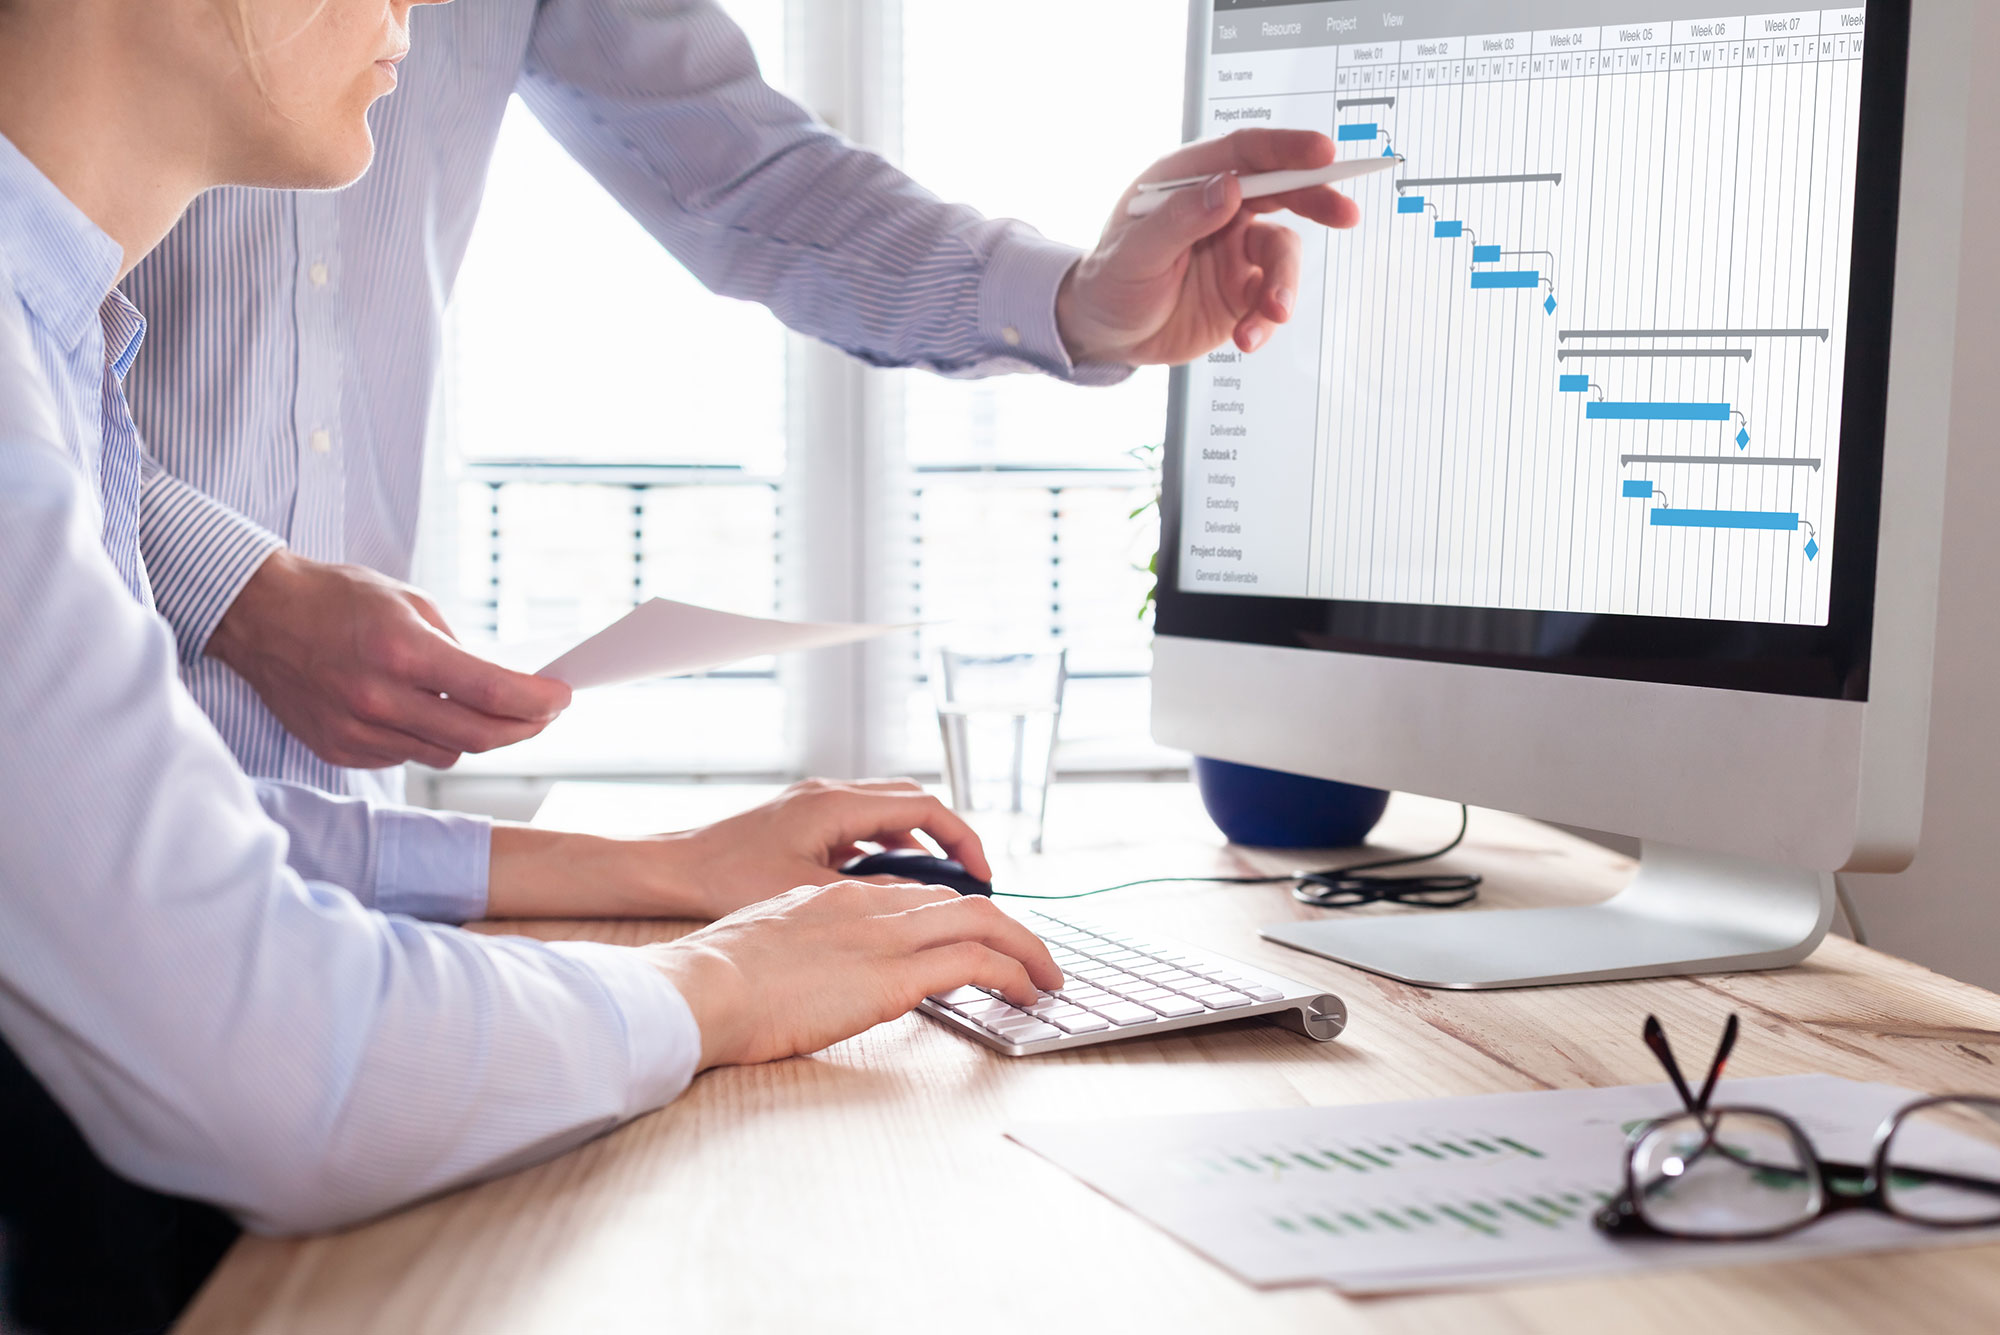 WBI-Wissensmanagement-fuer-Finanzen-Controlling